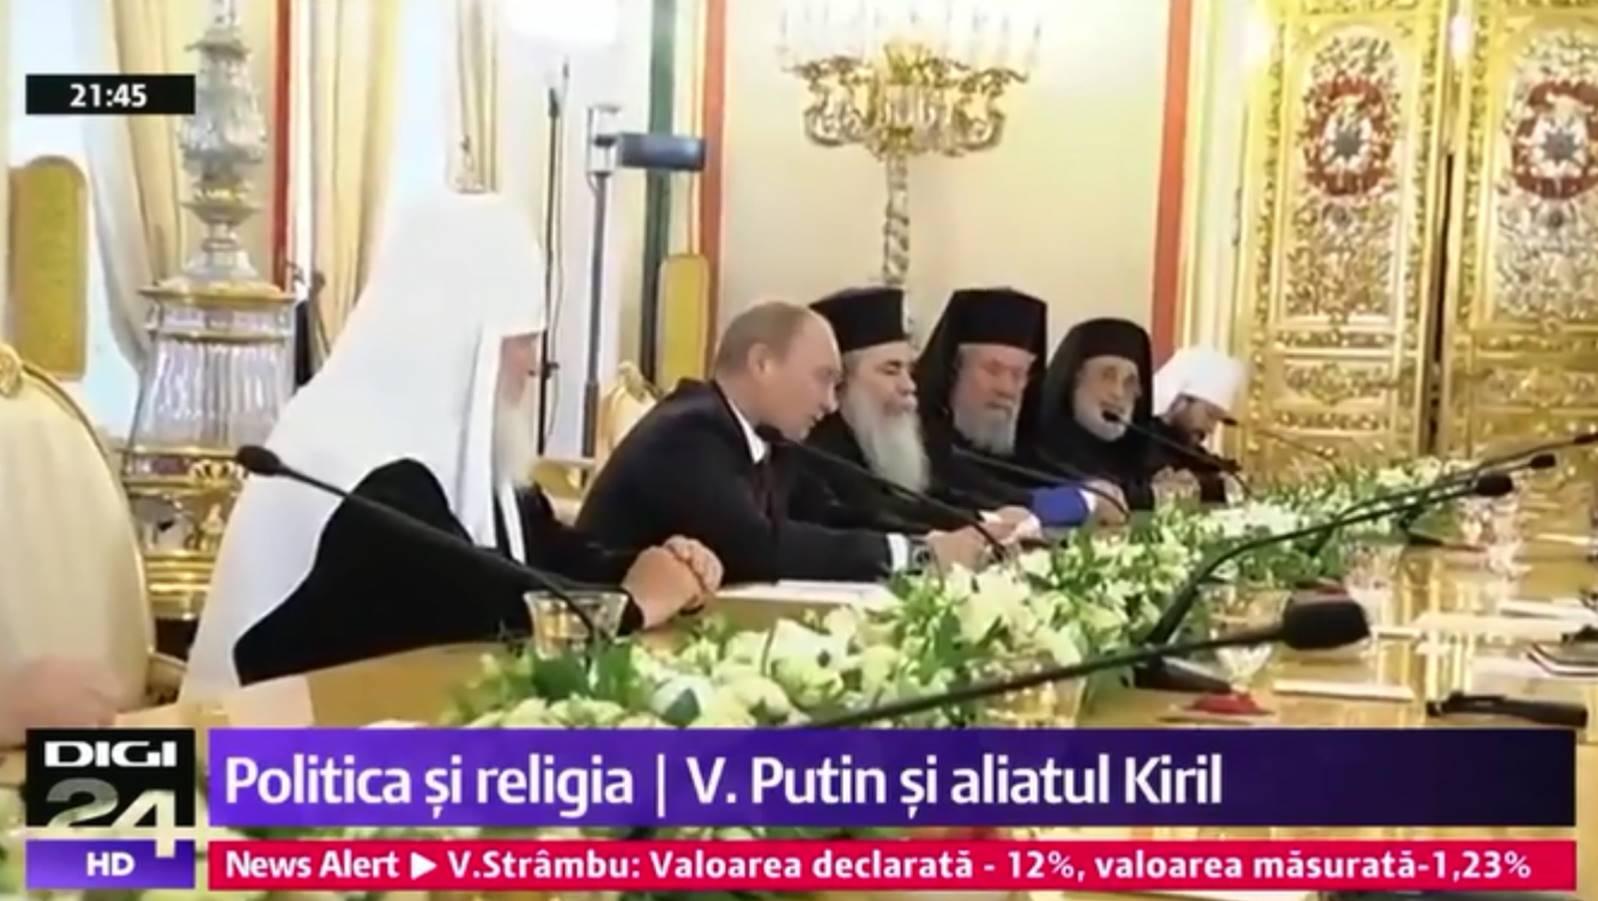 Putin_Kyrill